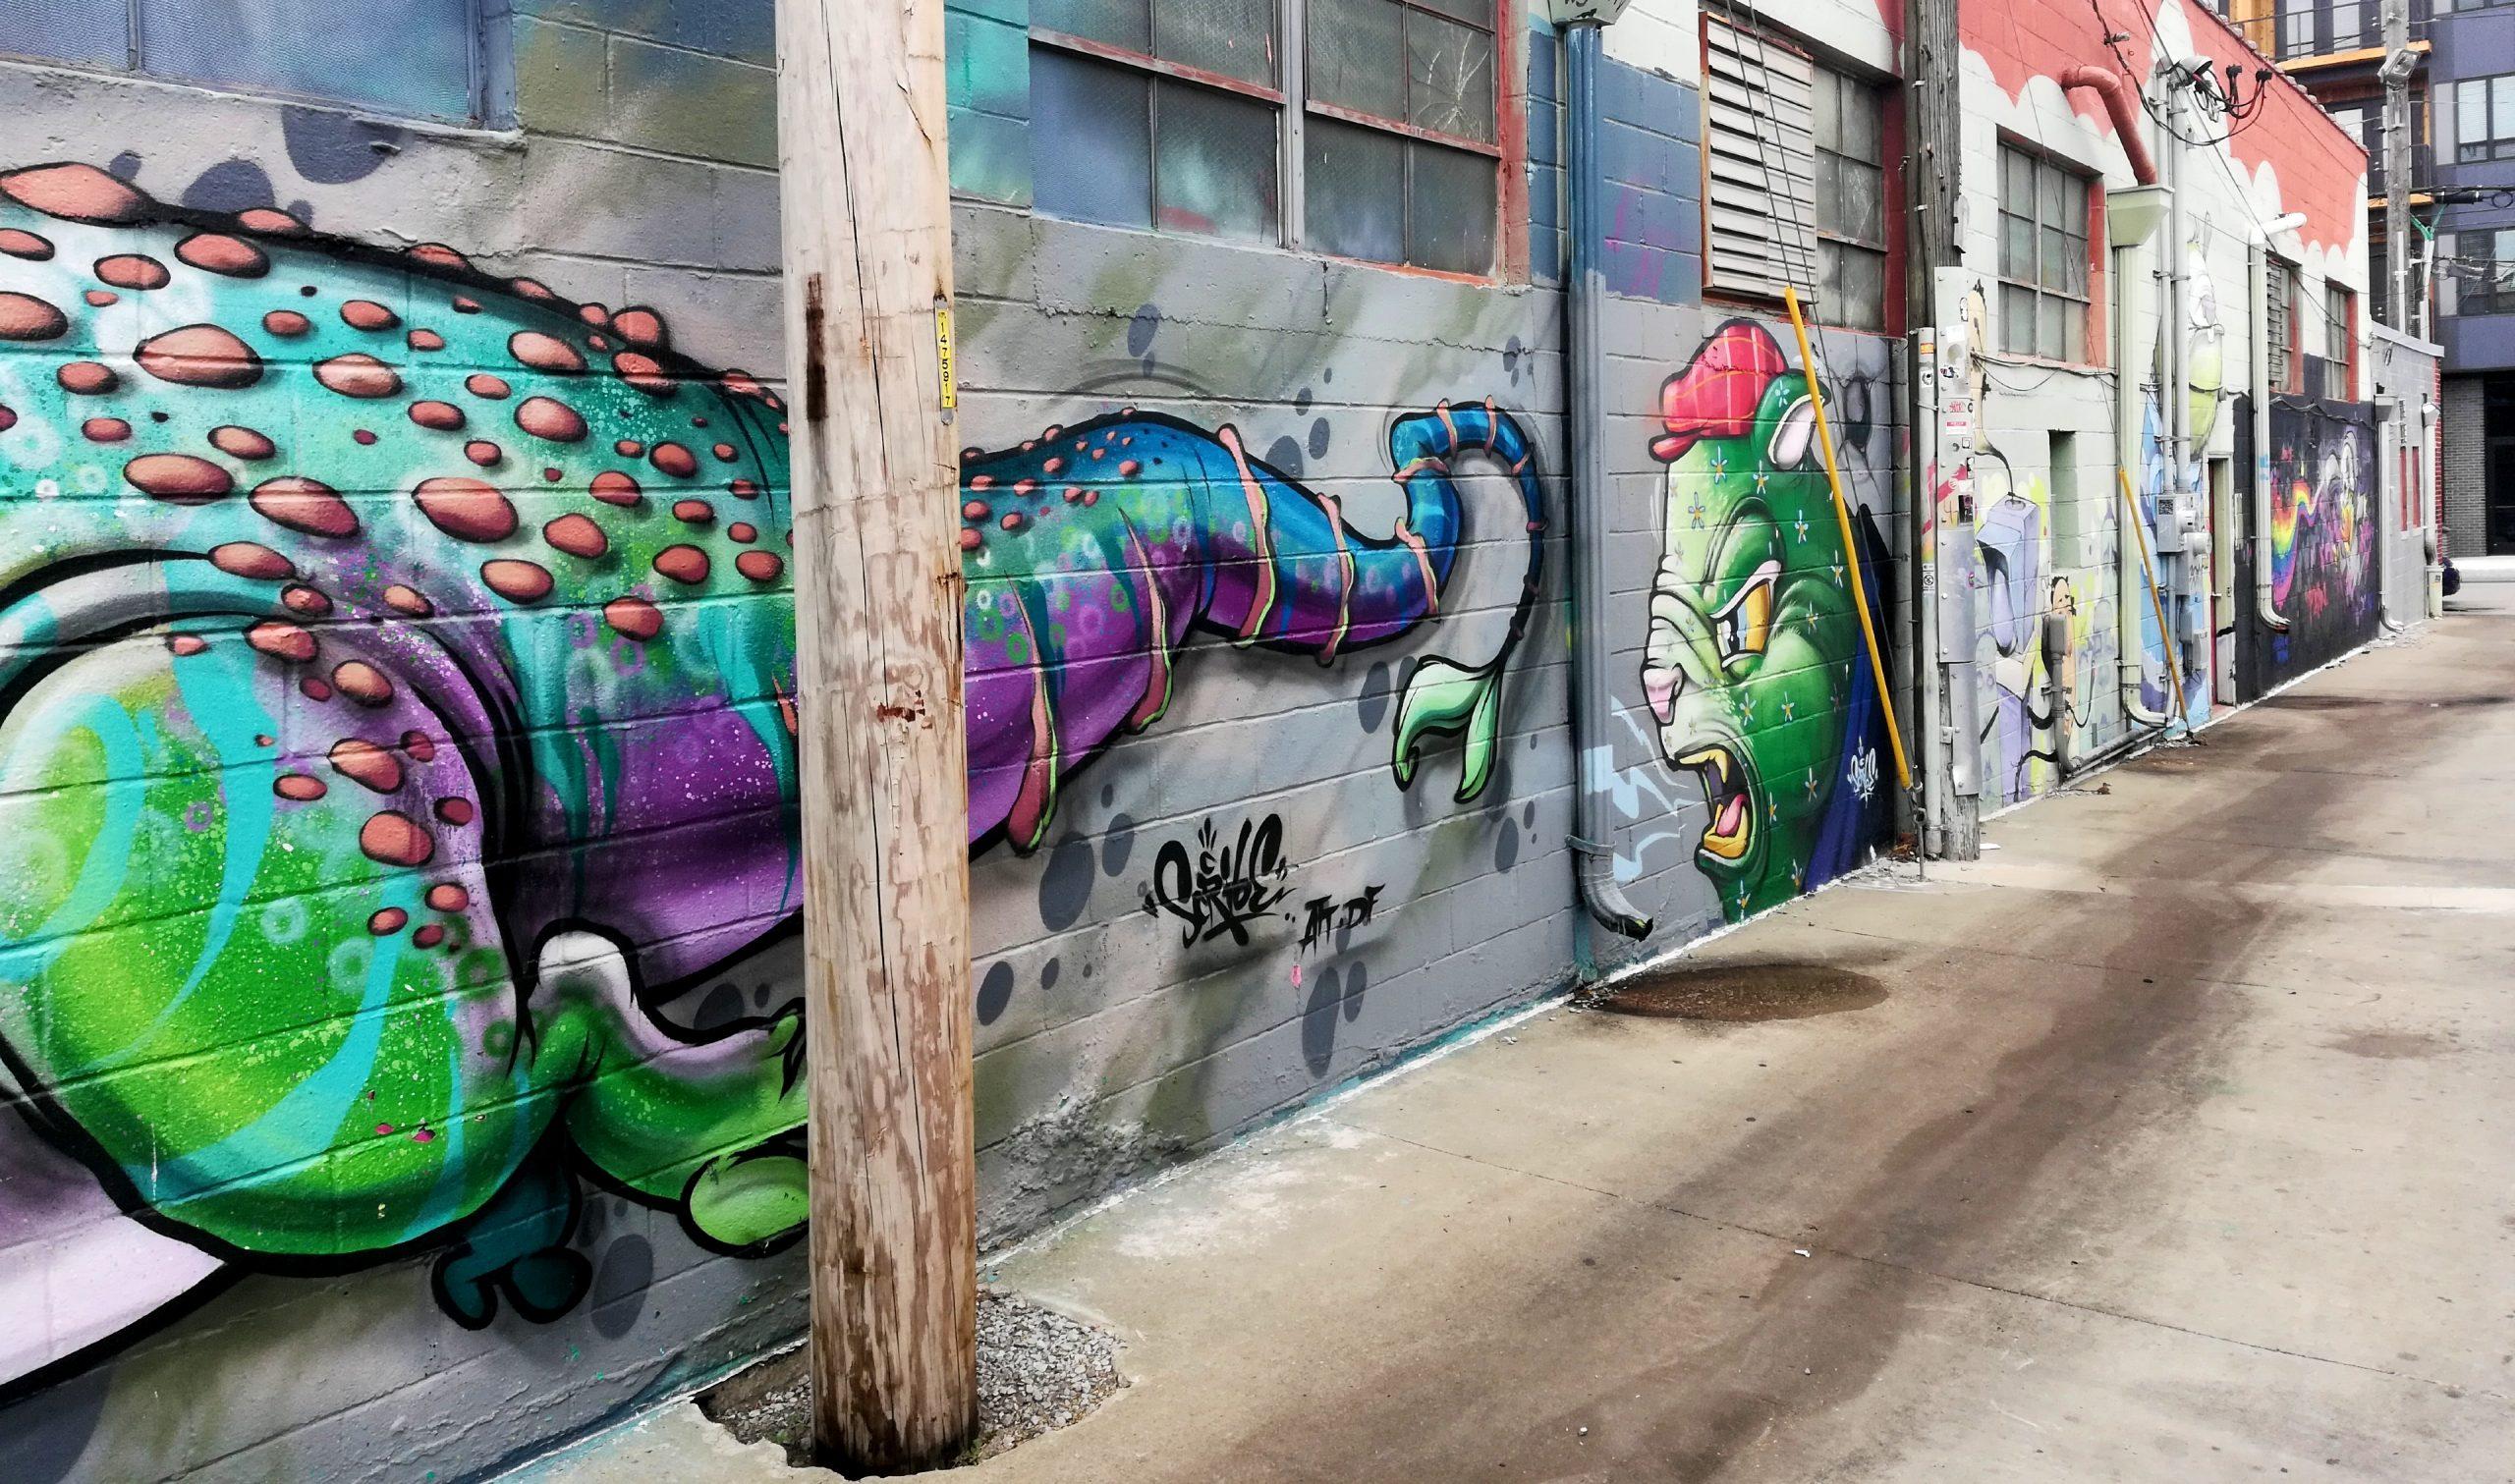 Scribe Alligator Wall Graffiti Kansas City Street Art KCMO